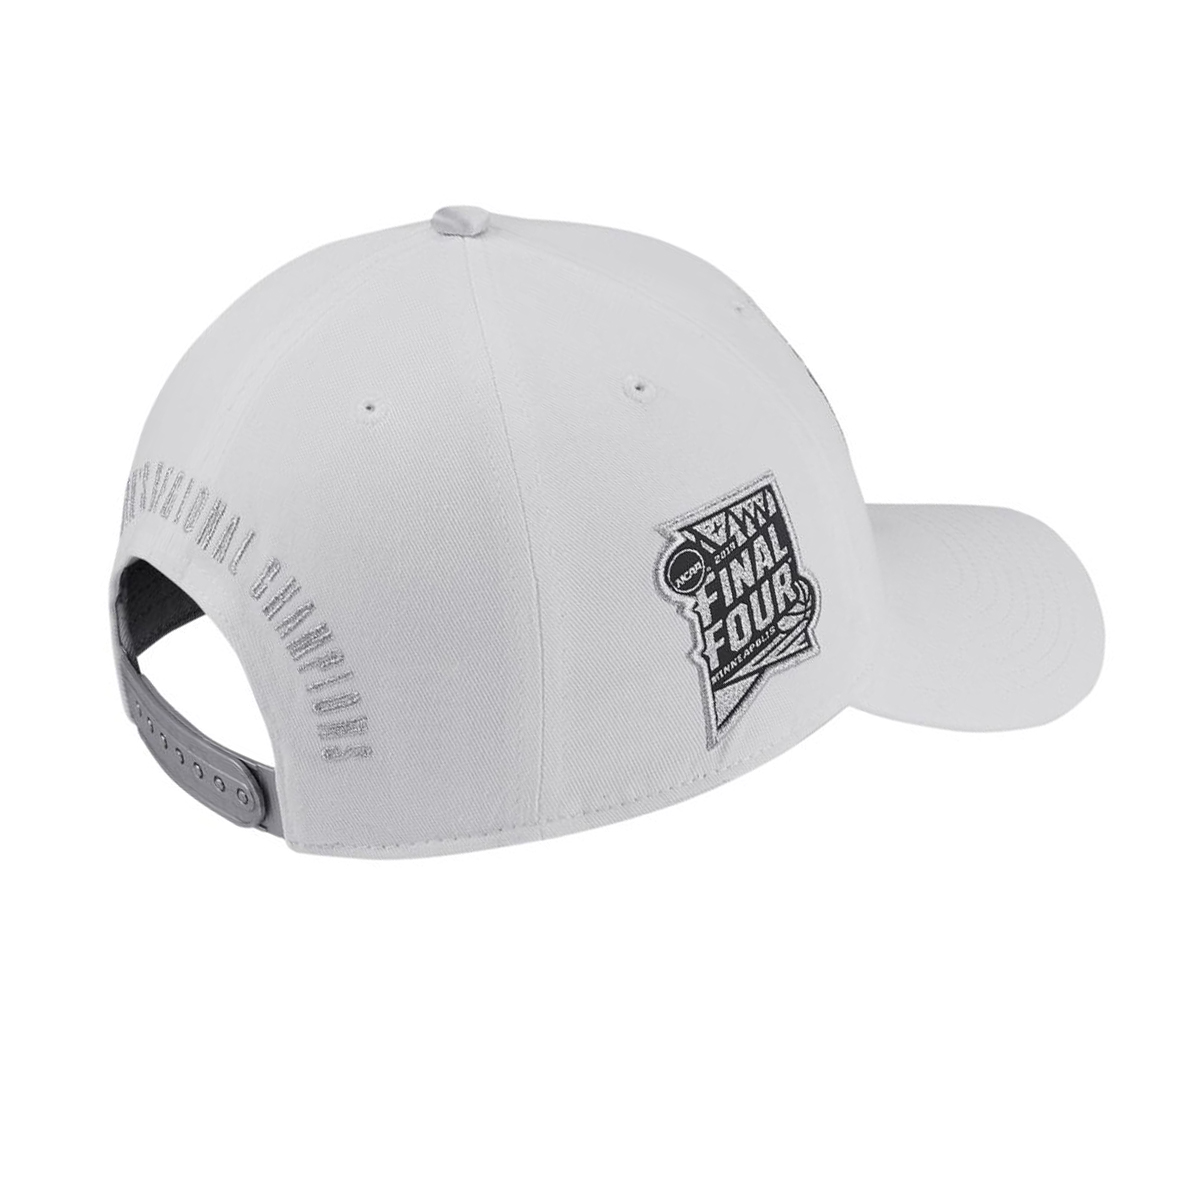 Official Nike Final 4/Regional Champs Locker Room Hat